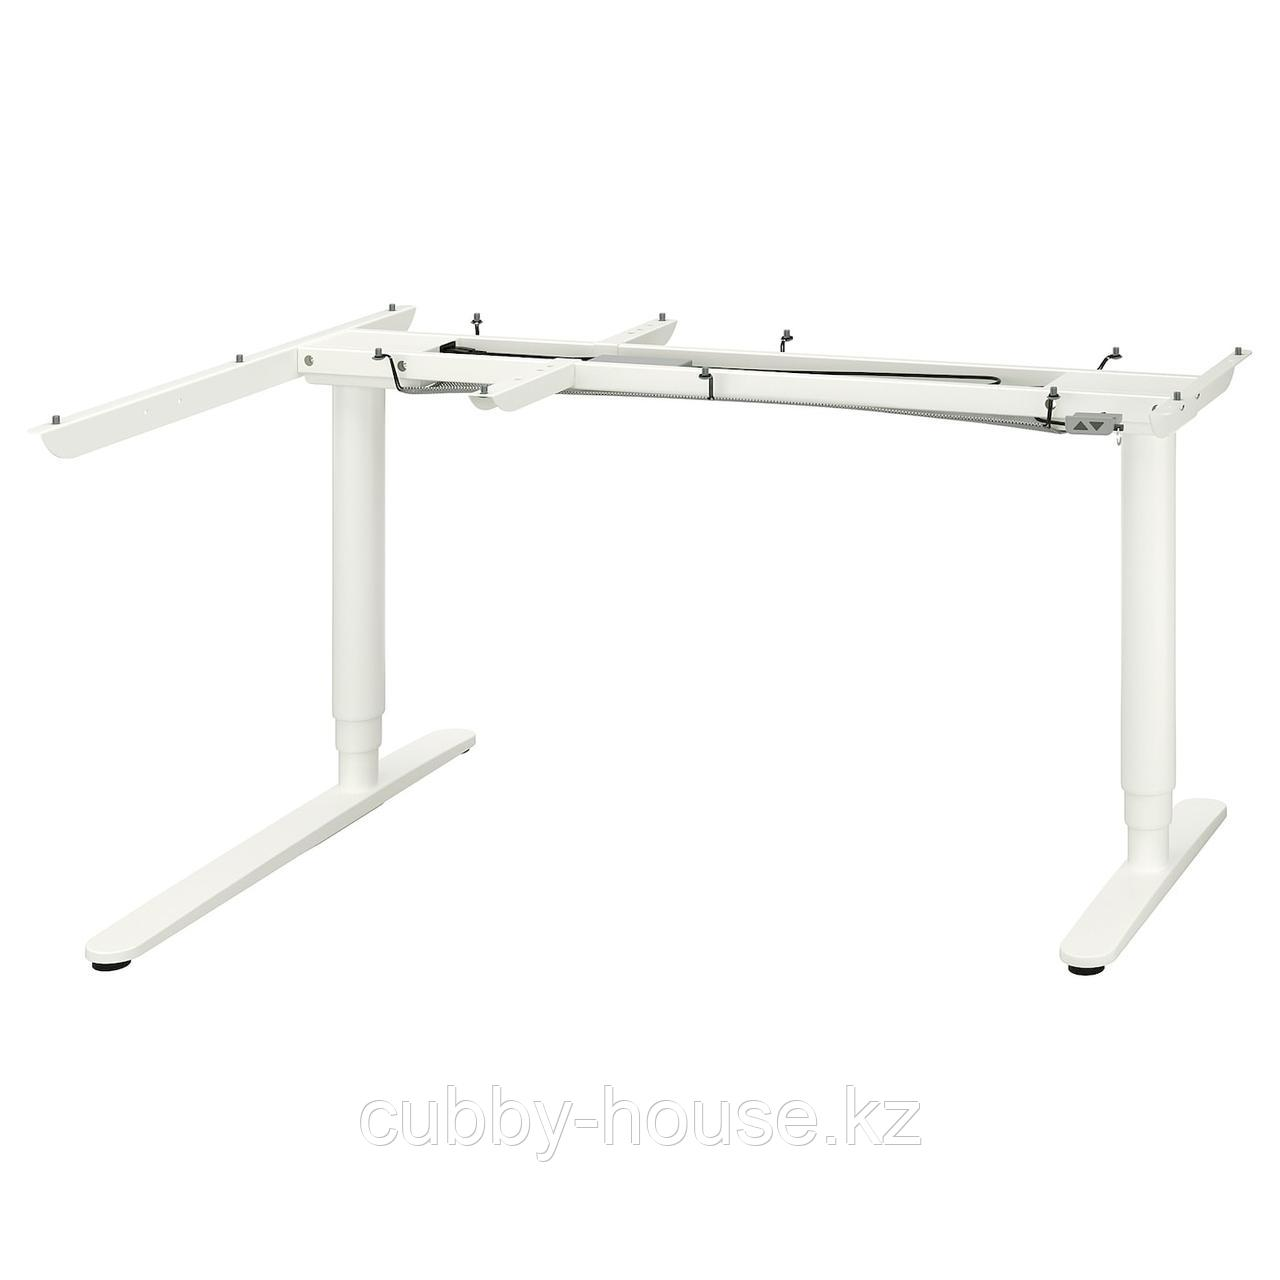 БЕКАНТ Угловой стол-трансформер,электр, белый, 160x110 см